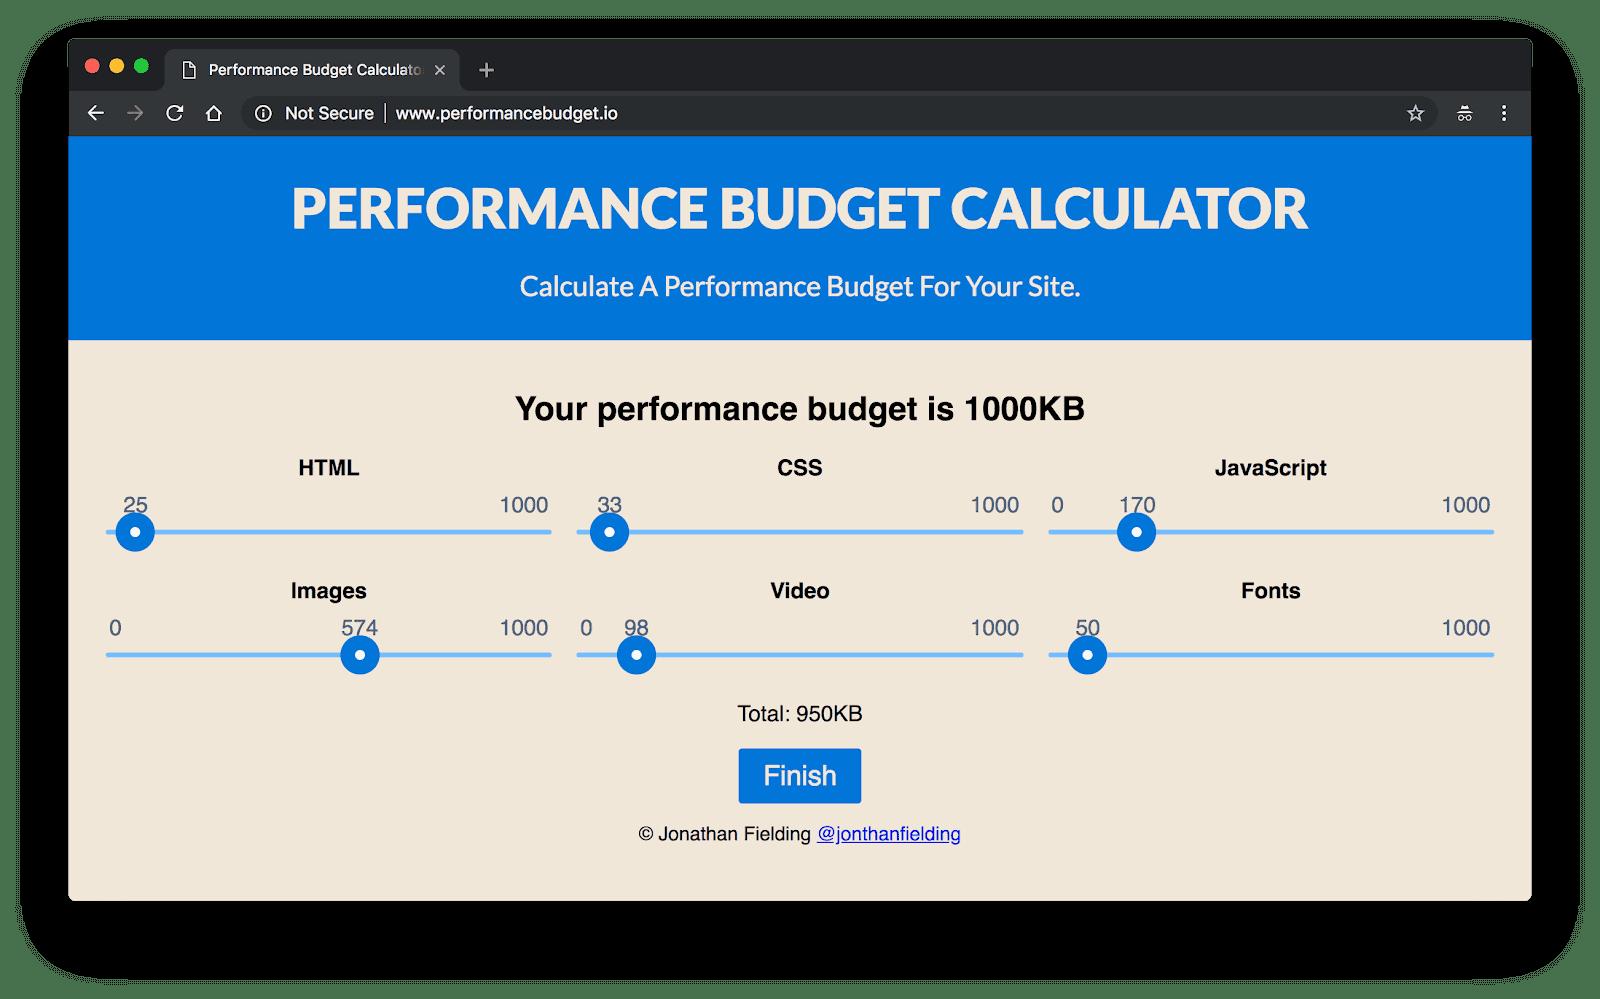 performance budget calculator image